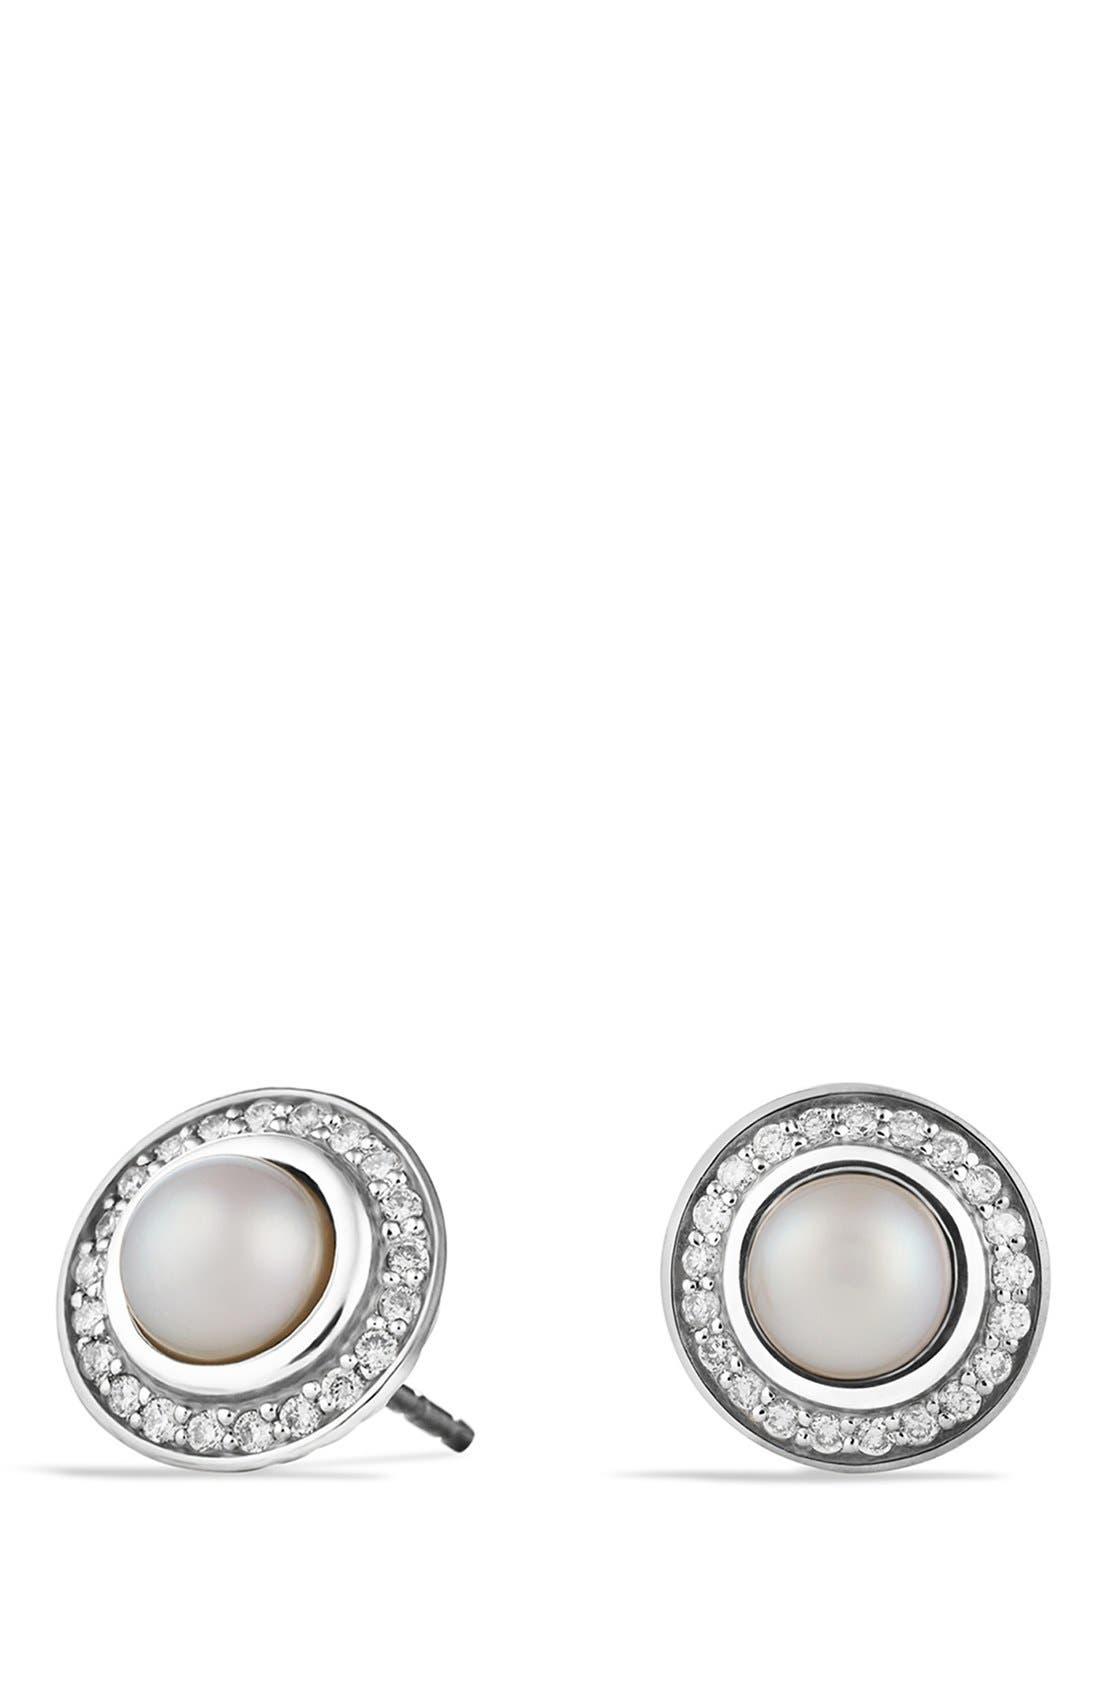 David Yurman 'Cerise' Mini Earrings with Semiprecious Stone & Diamonds